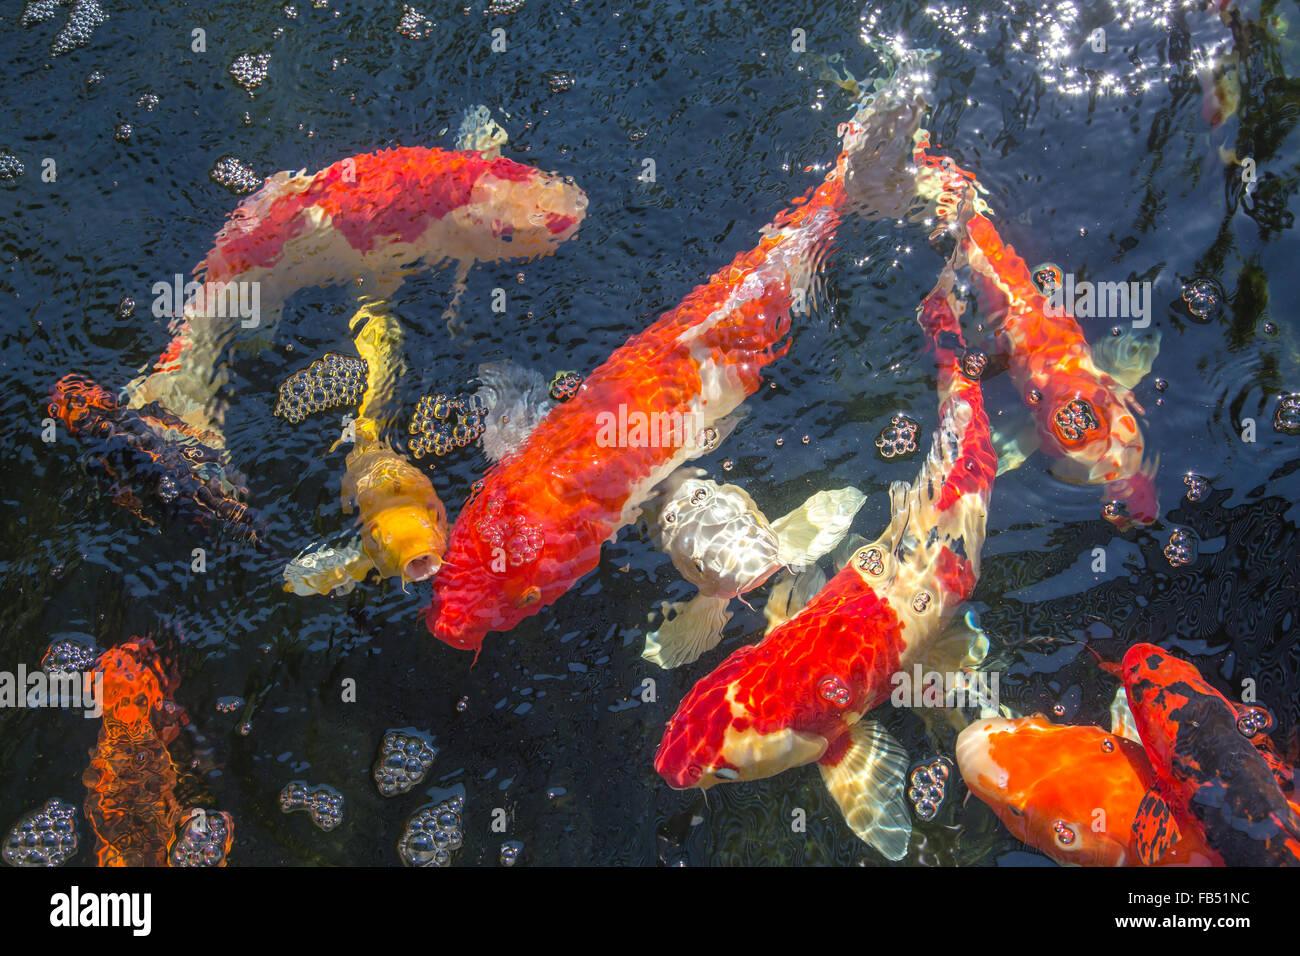 Carp Orange Koi Fish Stock Photos & Carp Orange Koi Fish Stock ...